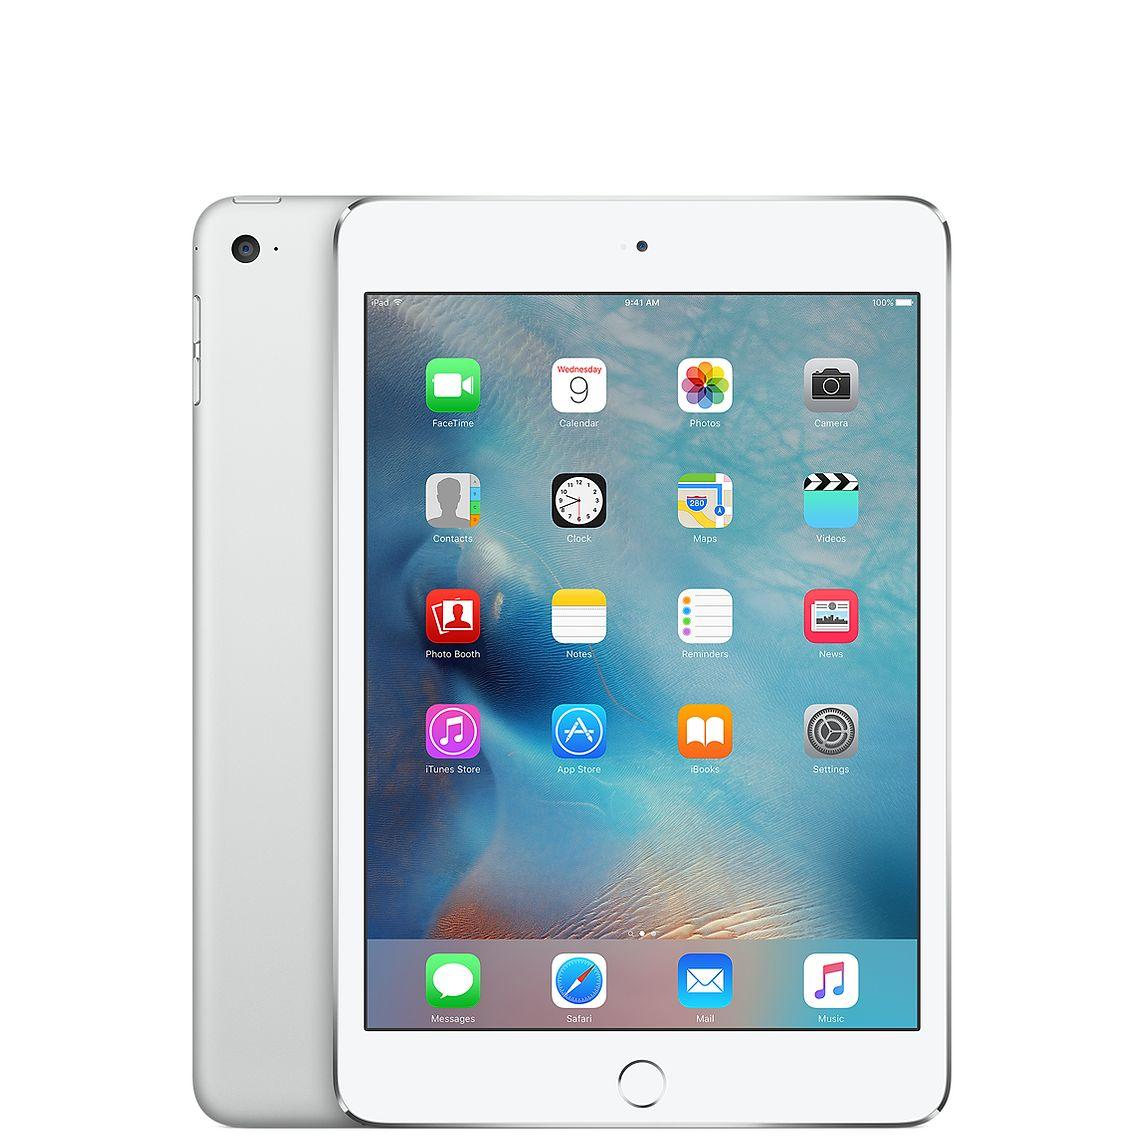 Refurbished iPad mini 4 Wi-Fi 16GB - Silver - £199 delivered @ Apple Store